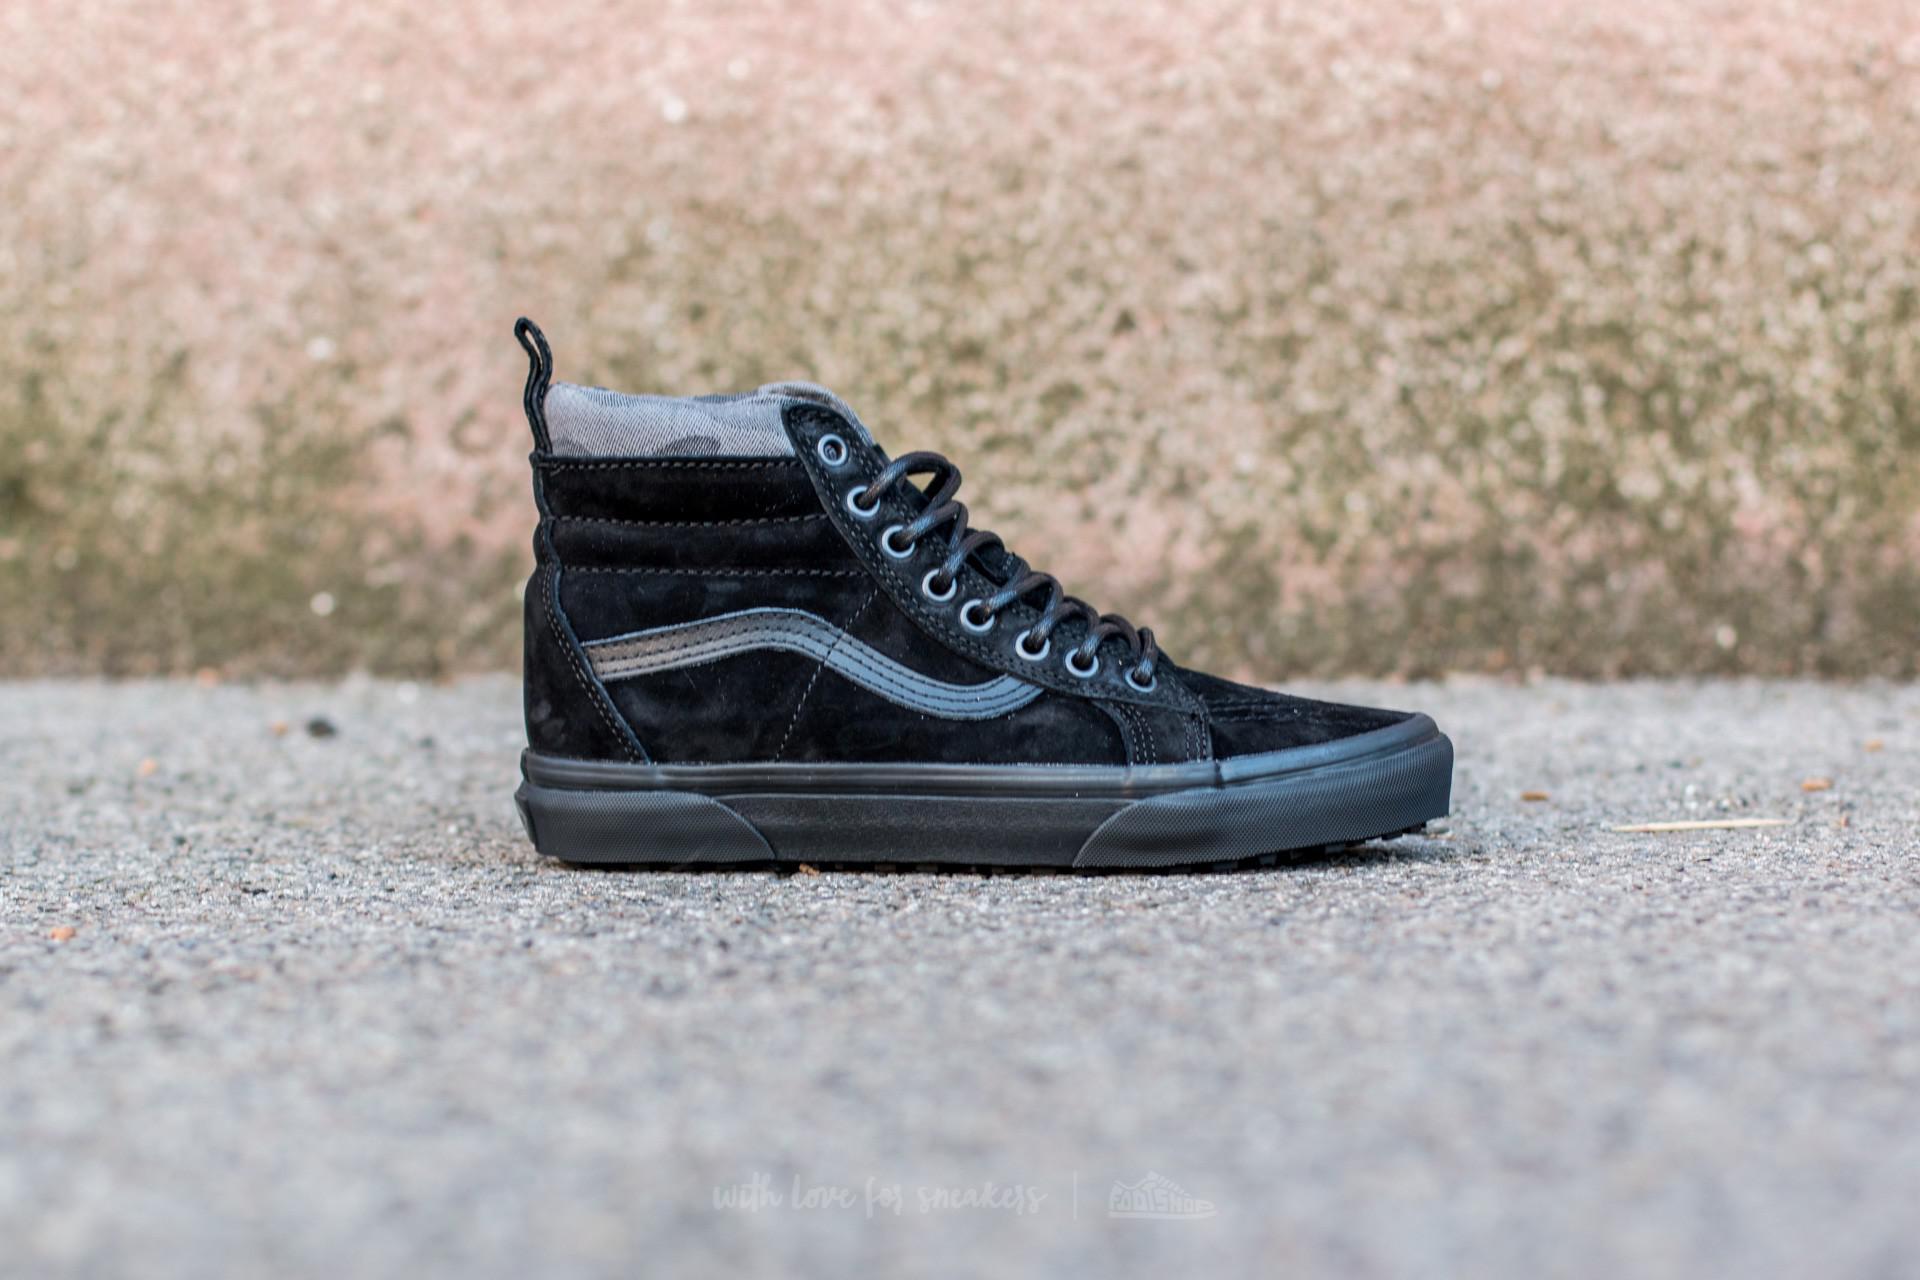 1d06ae1cb5 Lyst - Vans Sk8-hi Mte (mte) Black  Black  Camo in Black